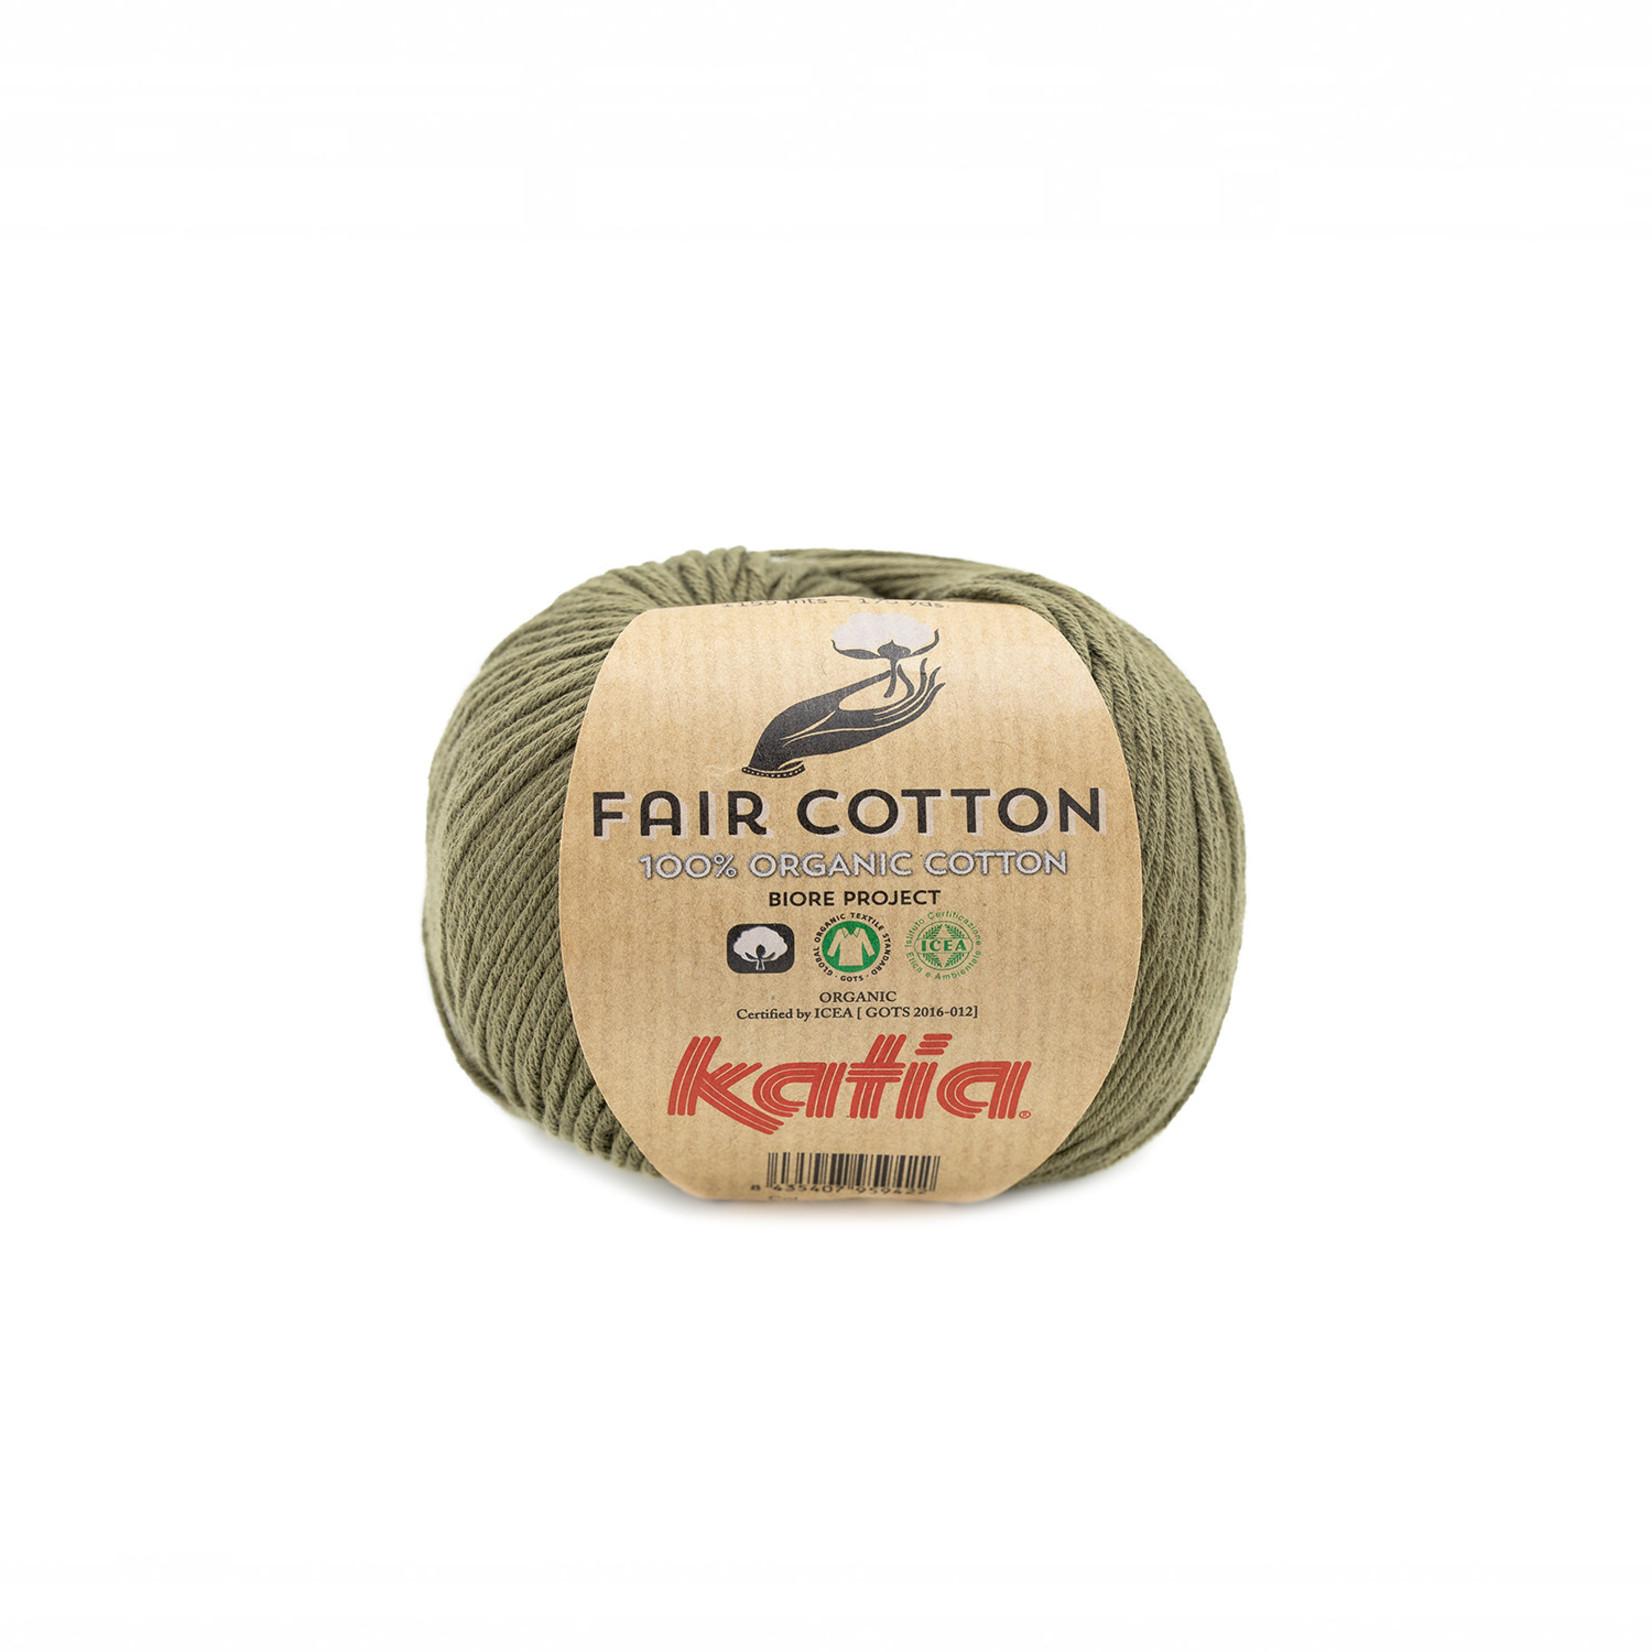 Katia Katia Fair Cotton 36 - kaki - 1 bol = 50 gr. = 155 m. - 100% biol. katoen